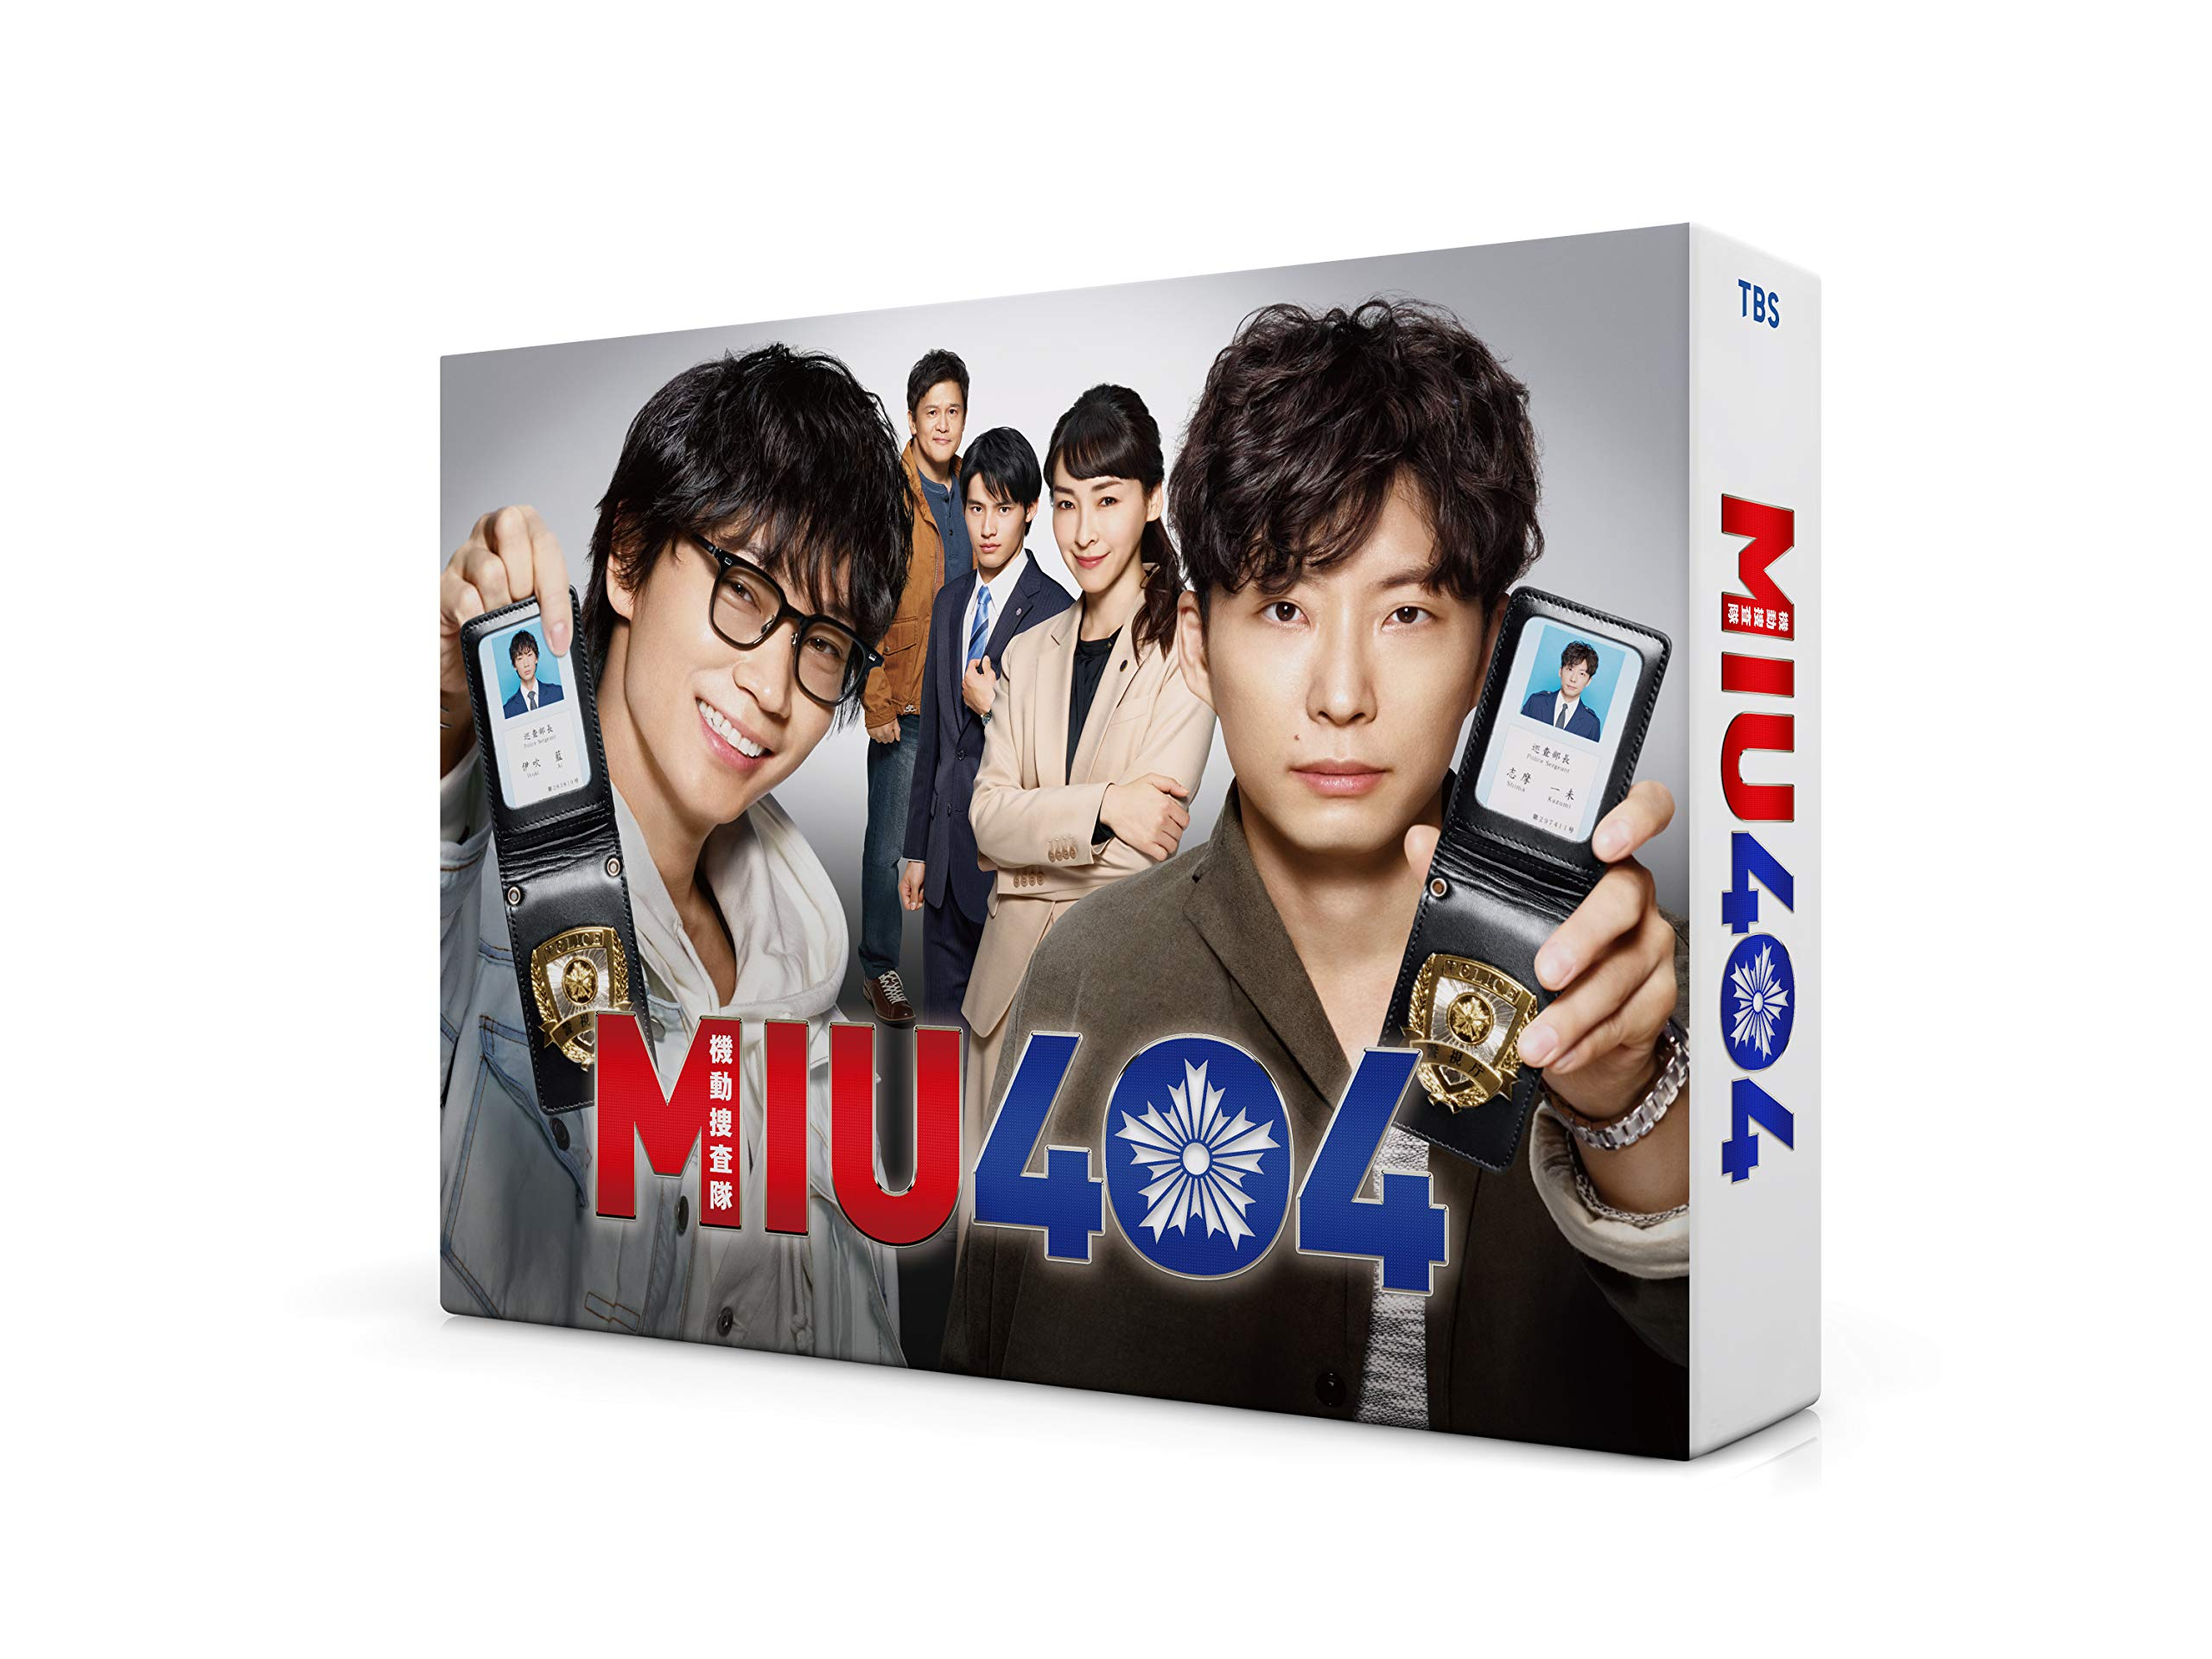 『MIU404 -ディレクターズカット版-』ブルーレイ&DVD BOX登場!初回生産限定特典・店舗特典・割引情報【12月25日発売!】